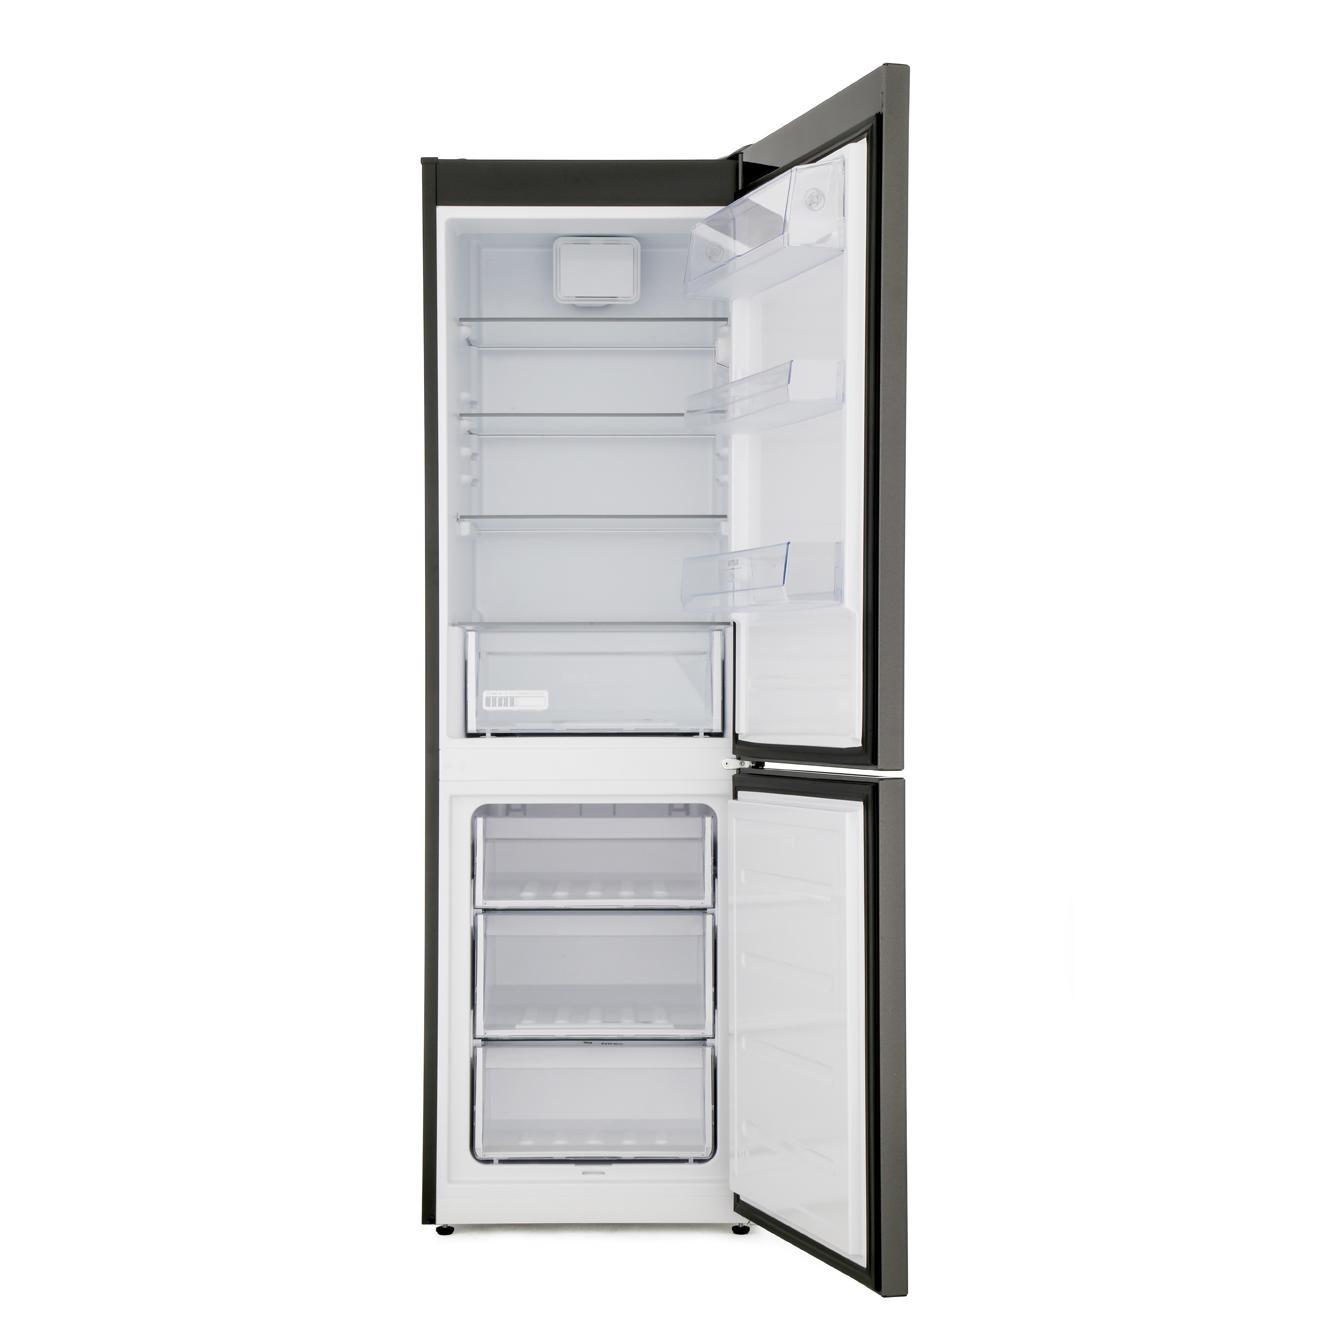 Hotpoint H8A1ESBWTD Fridge Freezer